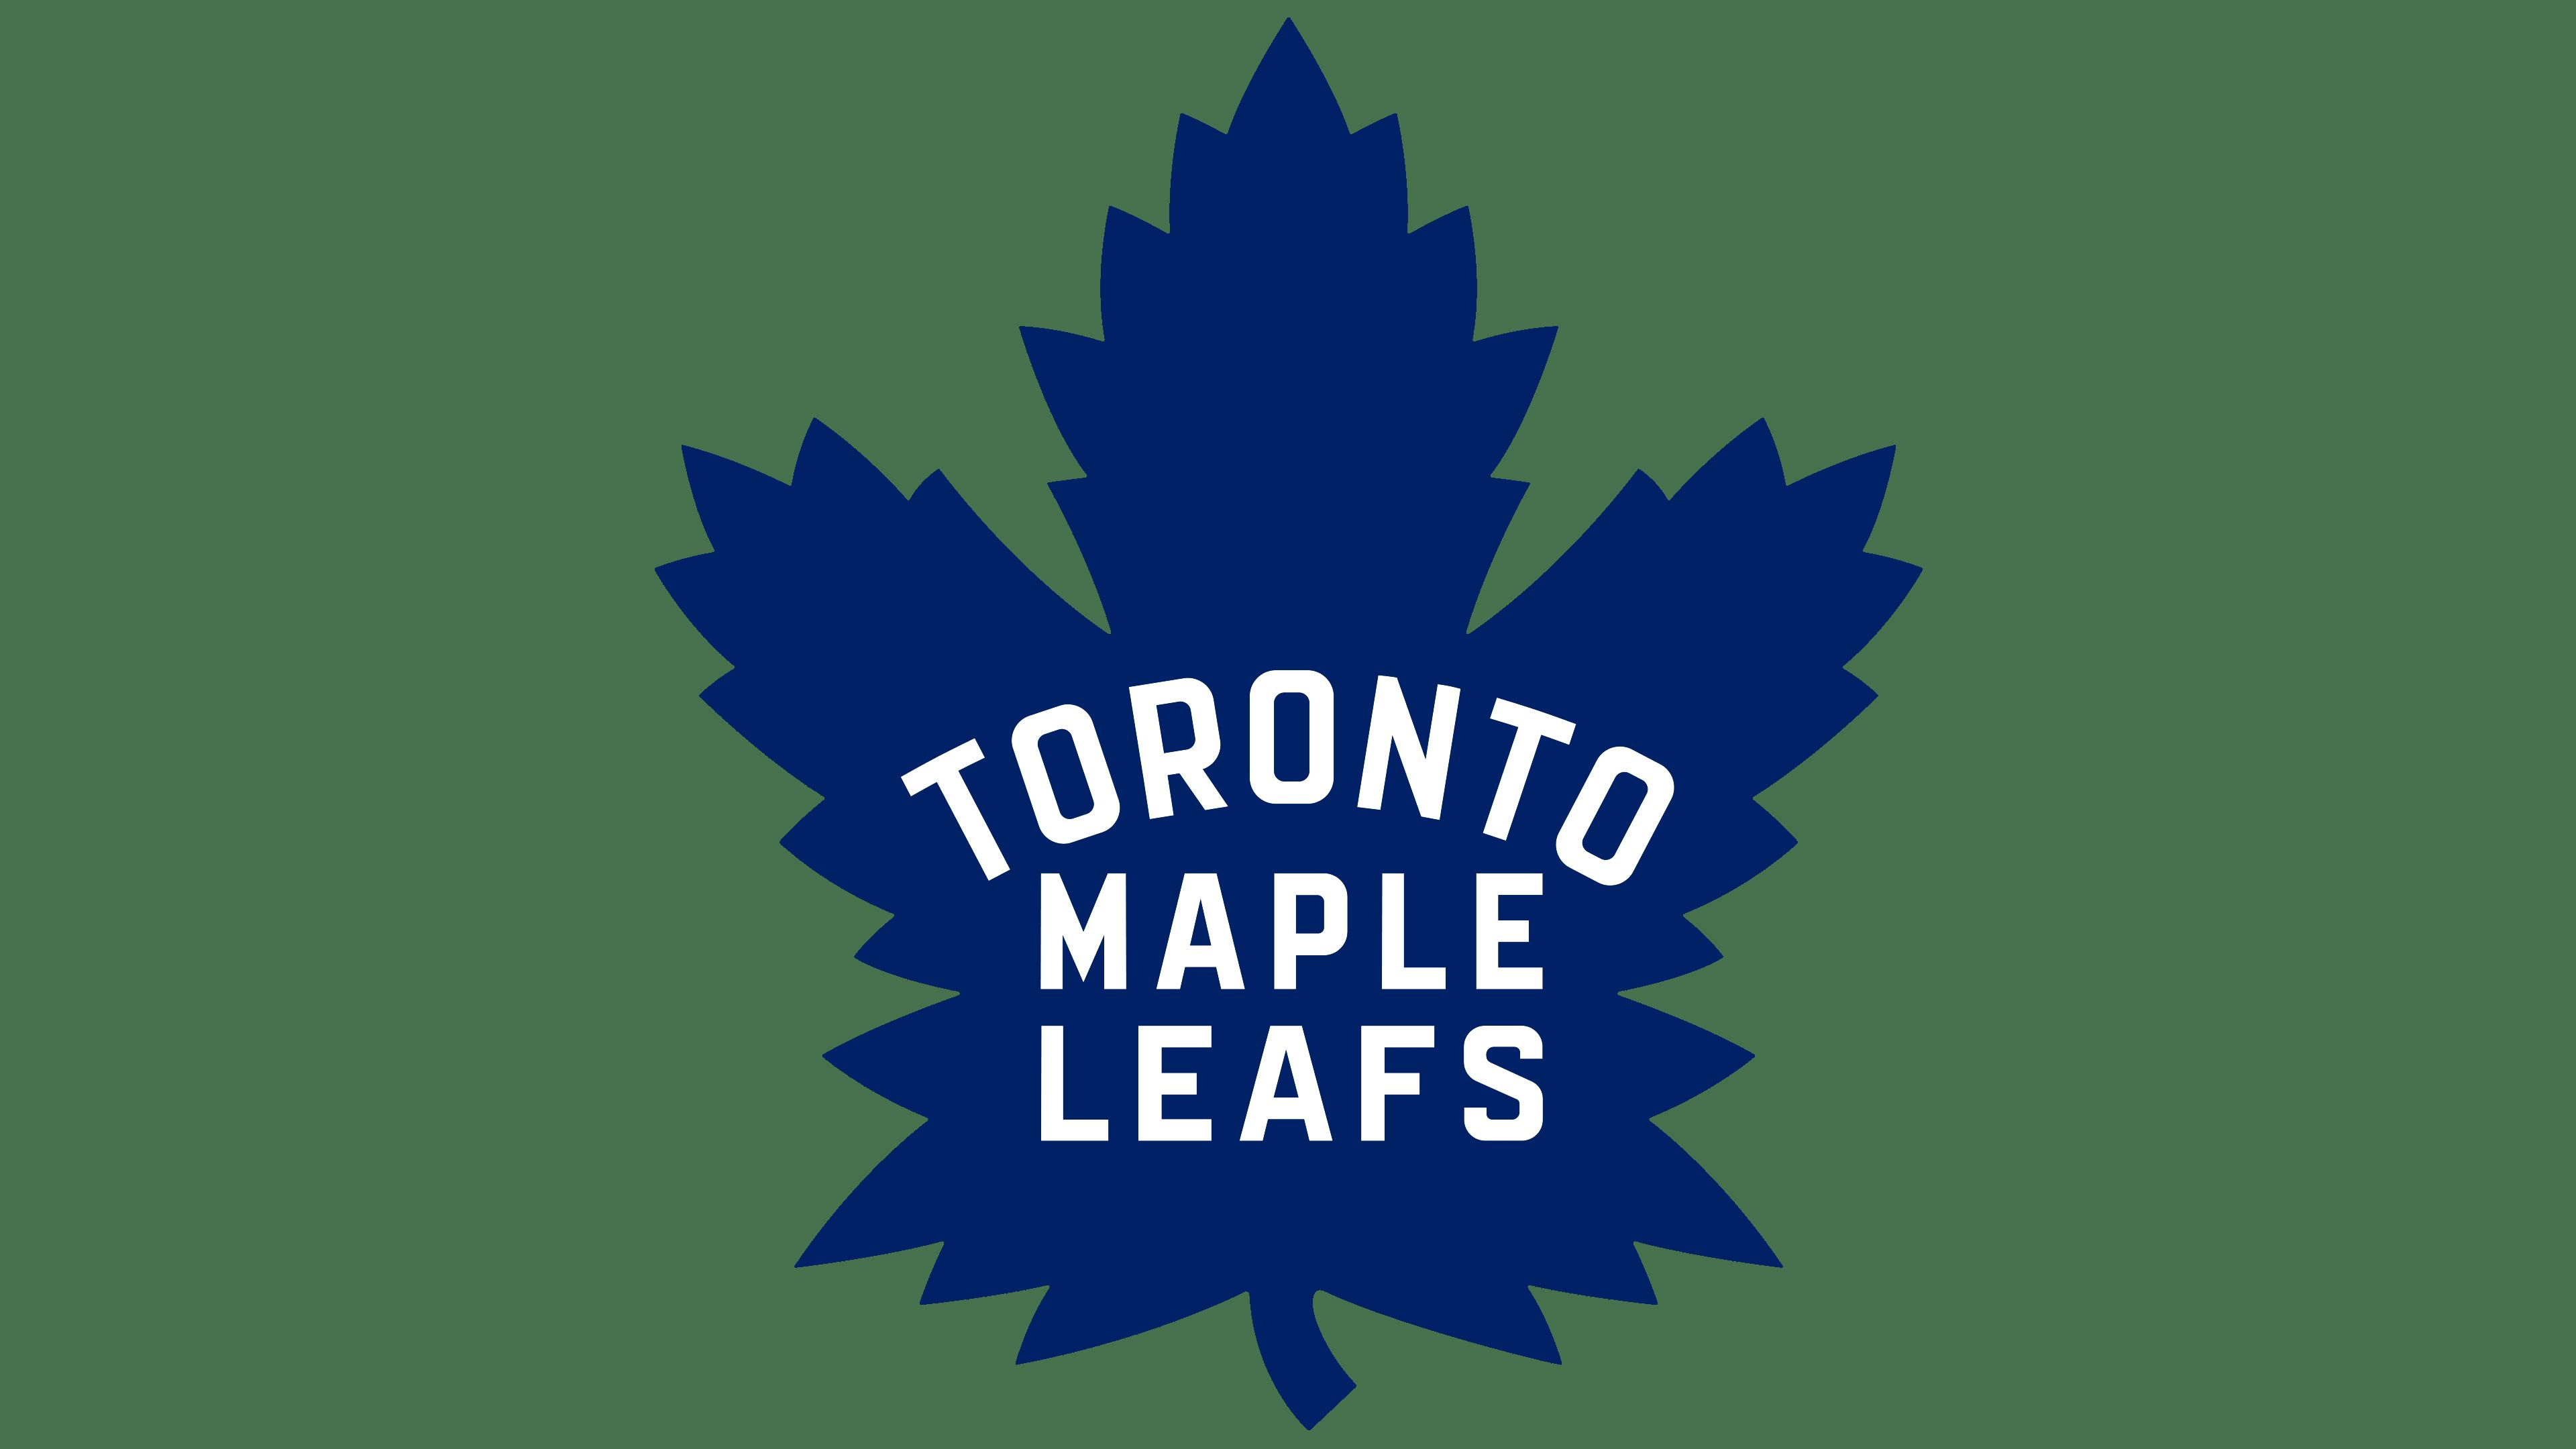 Toronto Maple Leafs Logos.